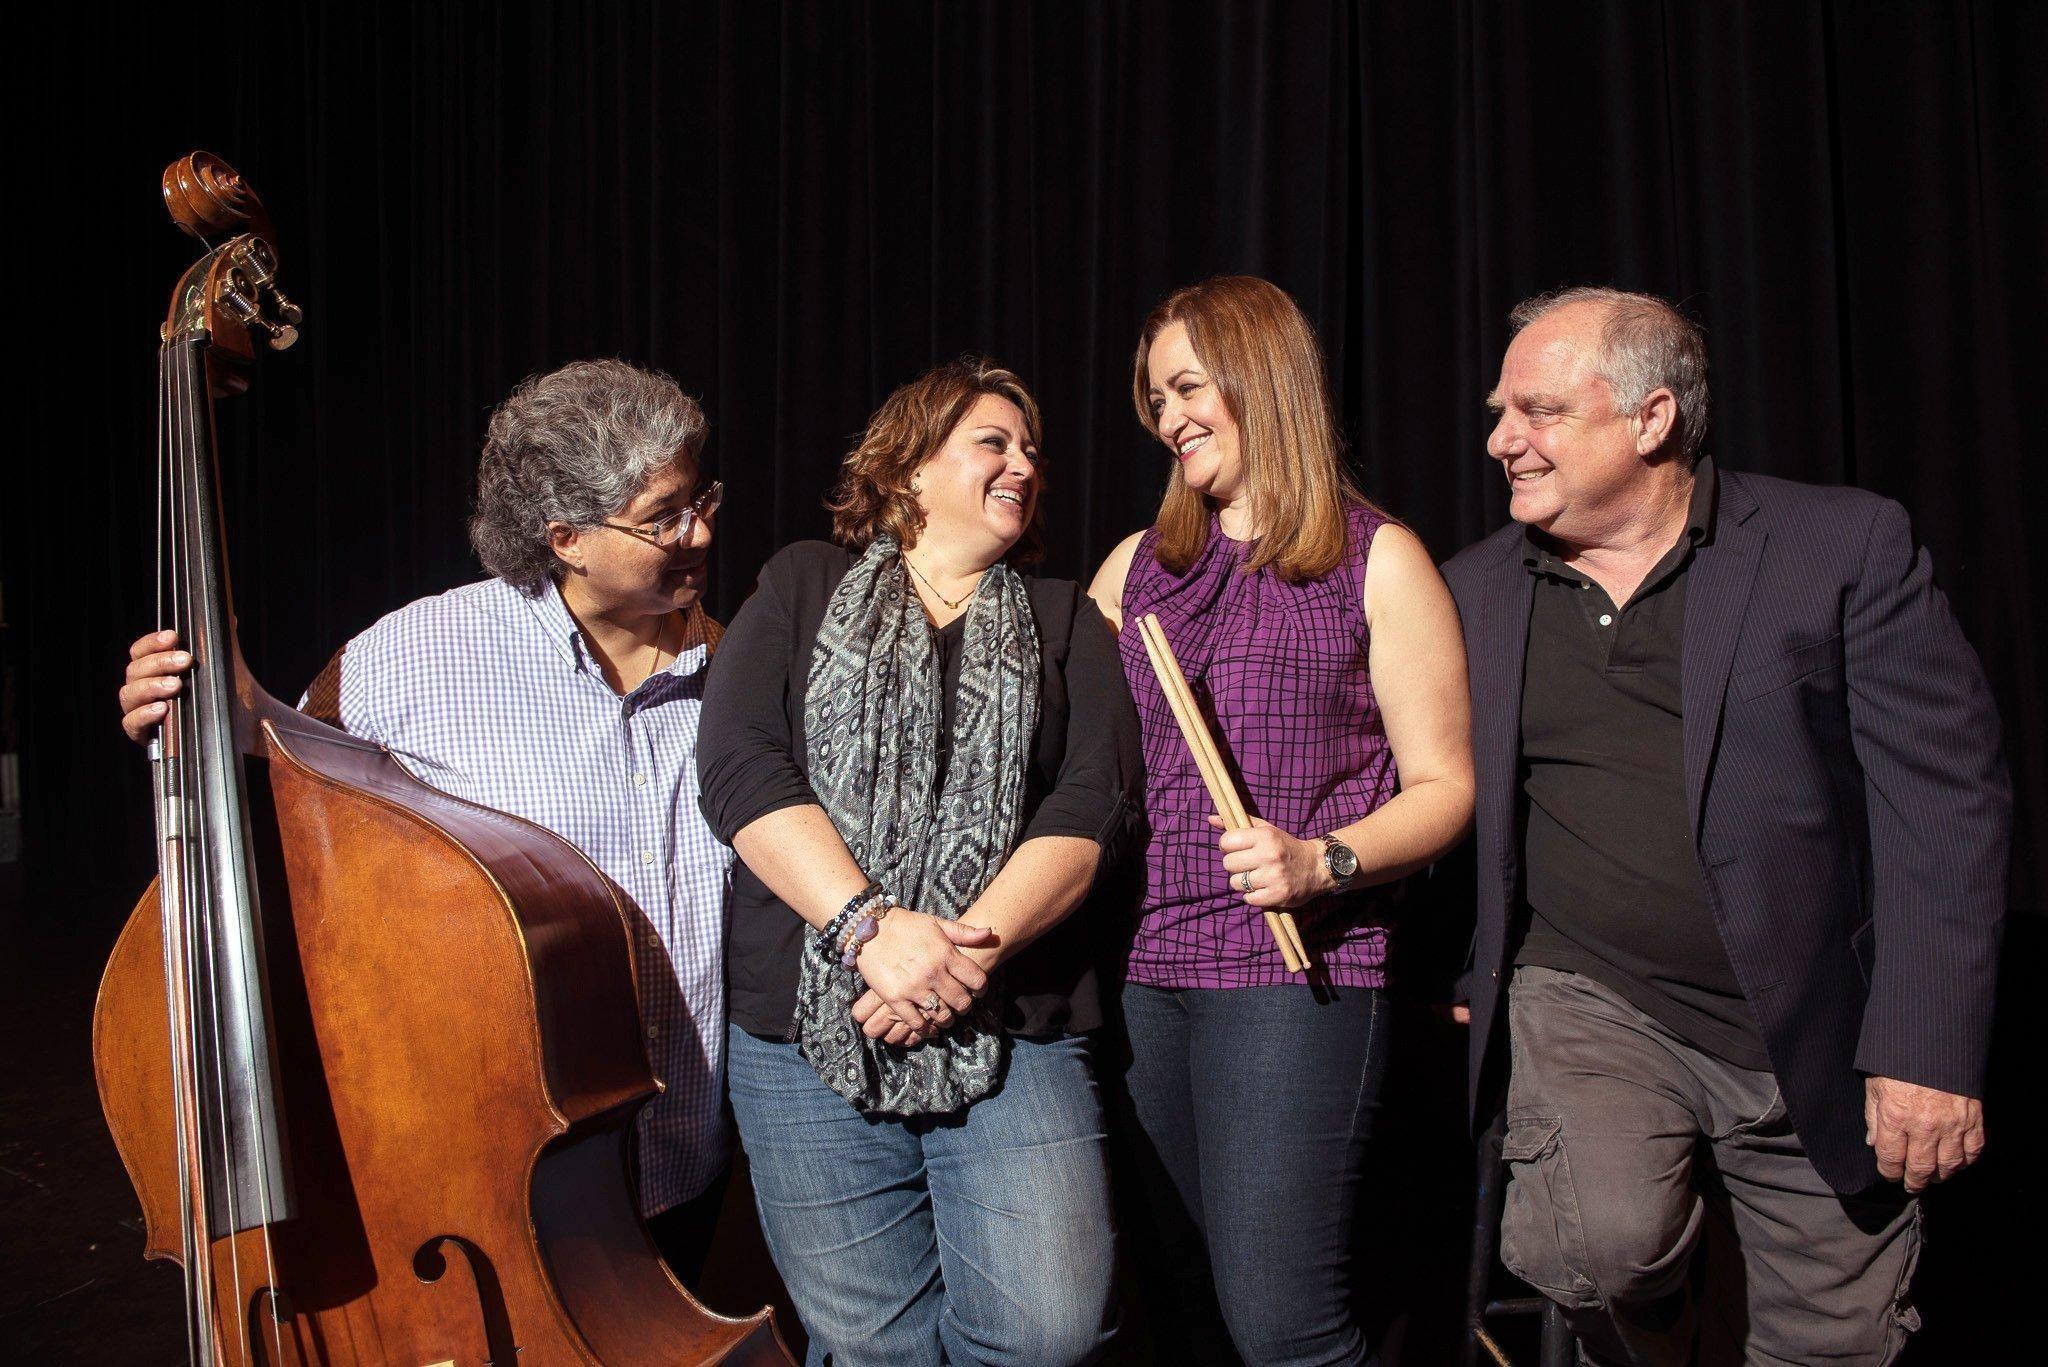 St Andrews School music teacher Elena Correia has a young son